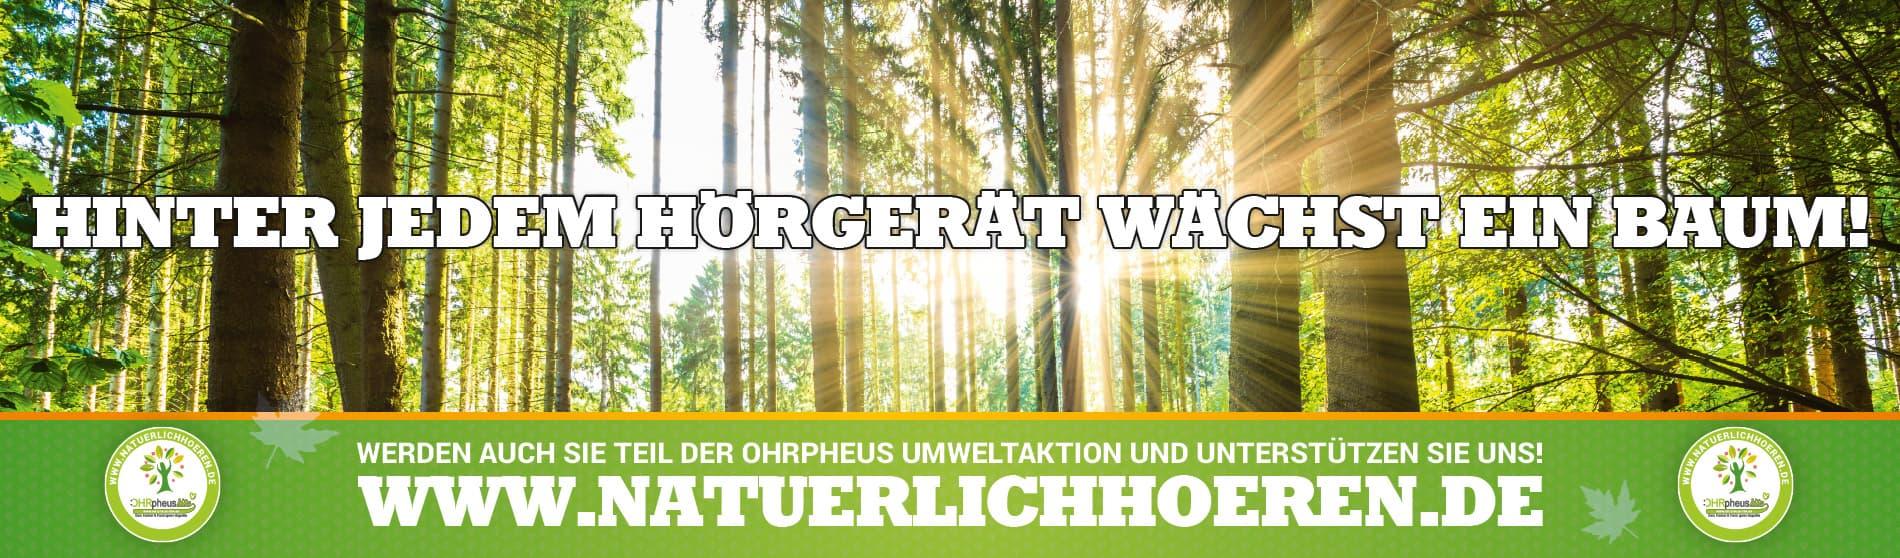 OHRpheus lite Umweltaktion Sonne im Wald